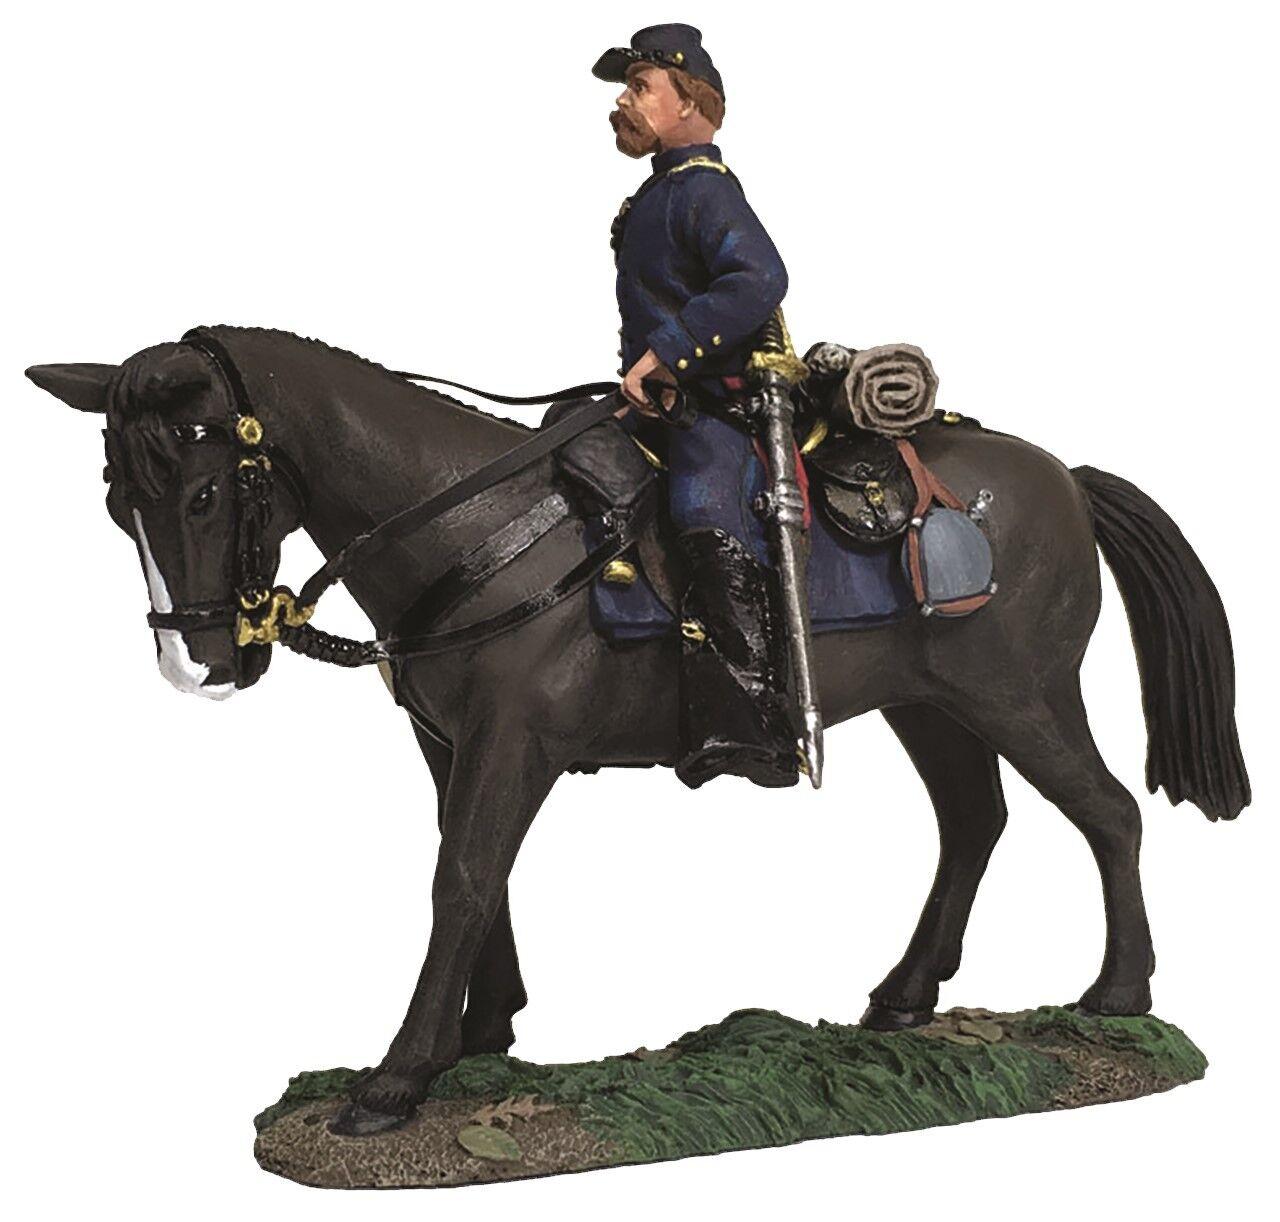 Britains Bürgerkrieg Union 31276 Federal Infanterie Offizier Berittener MIB